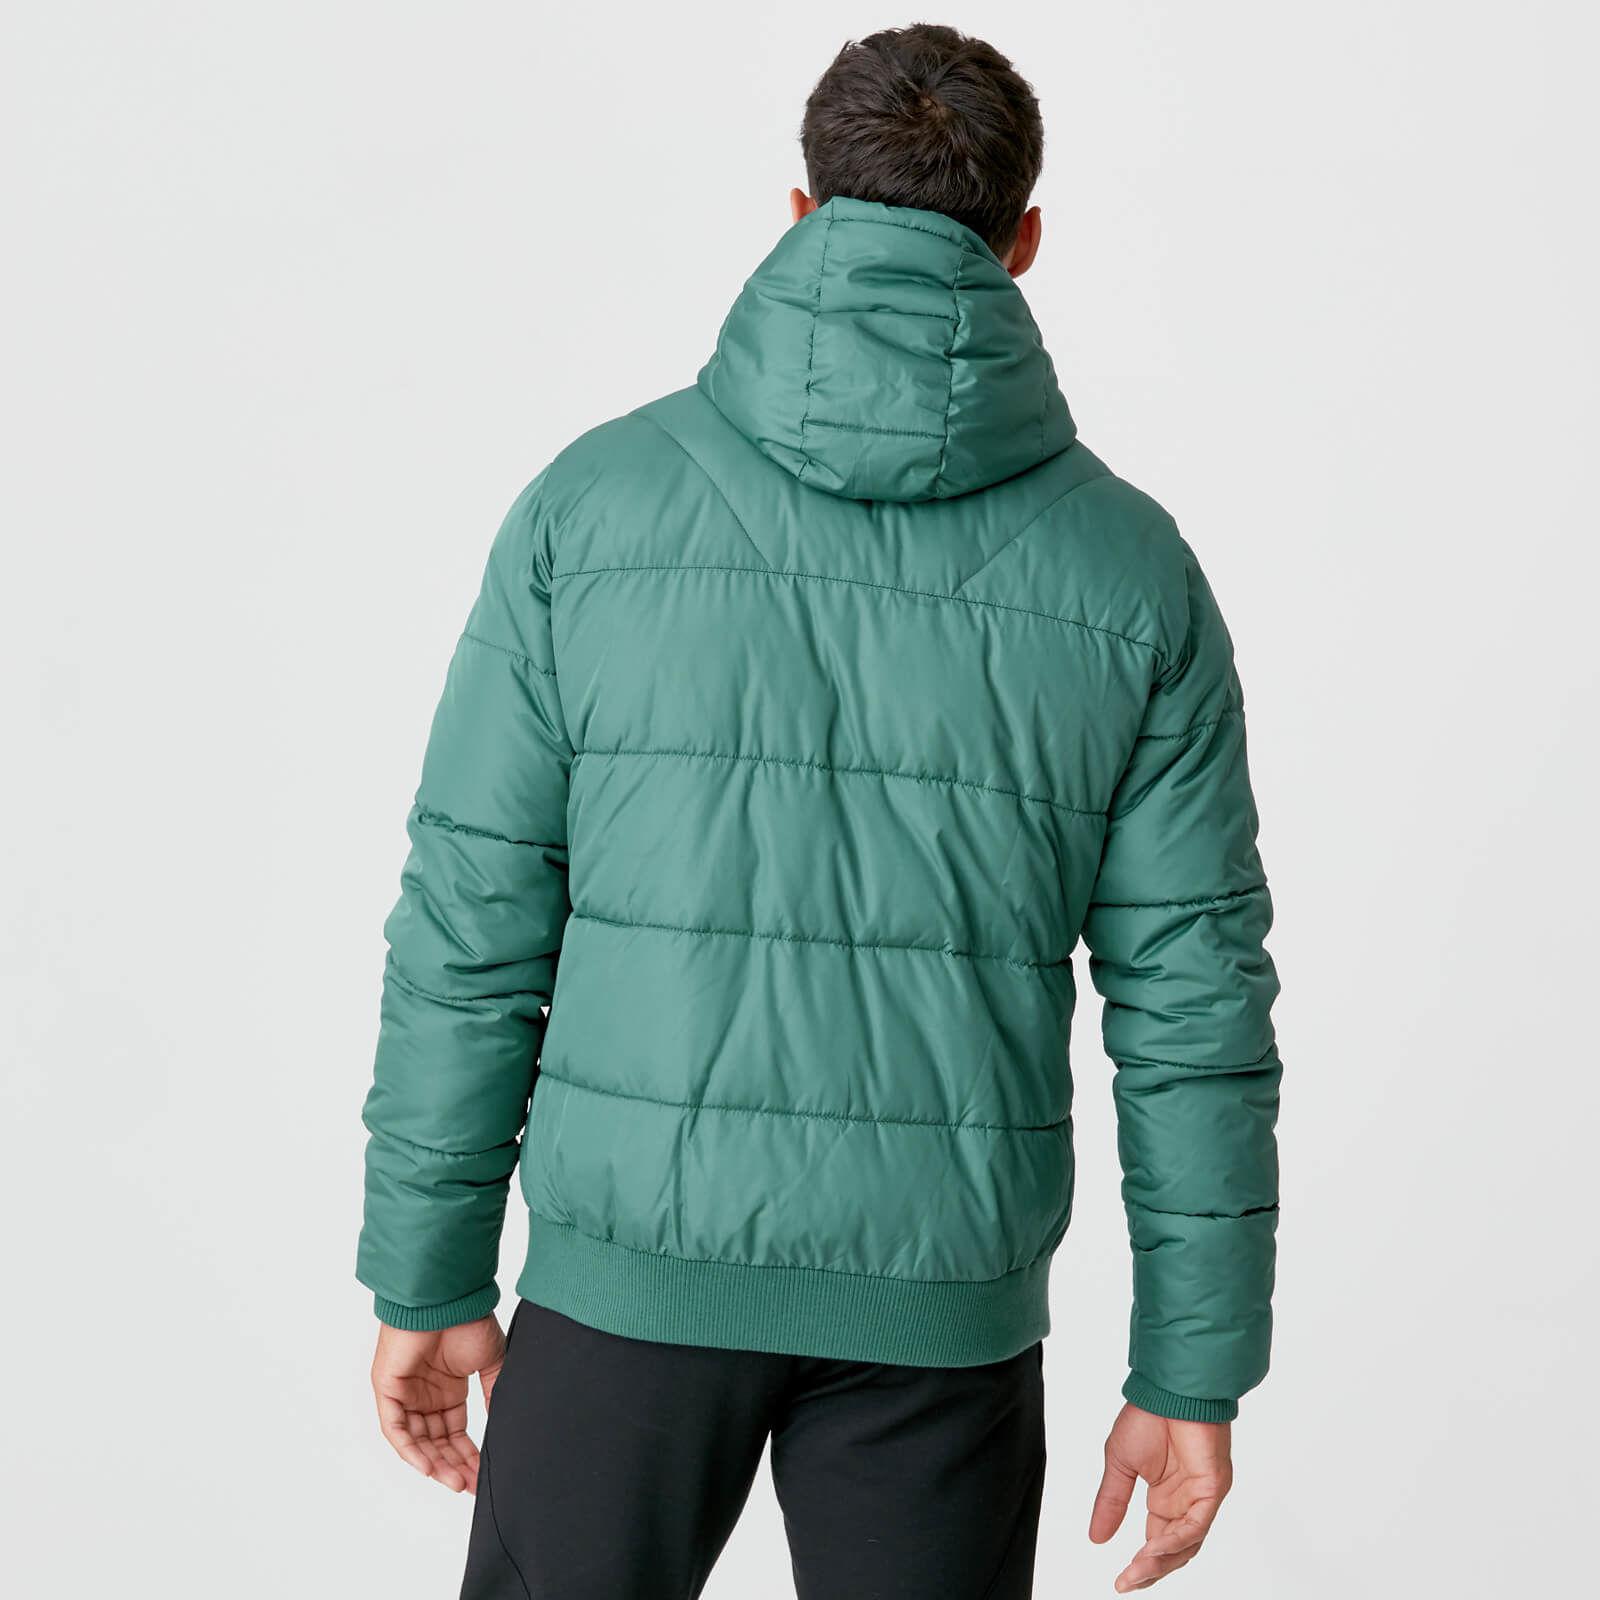 Myprotein Pro-Tech Protect Puffer Jacket - Pine | Hbito.ma